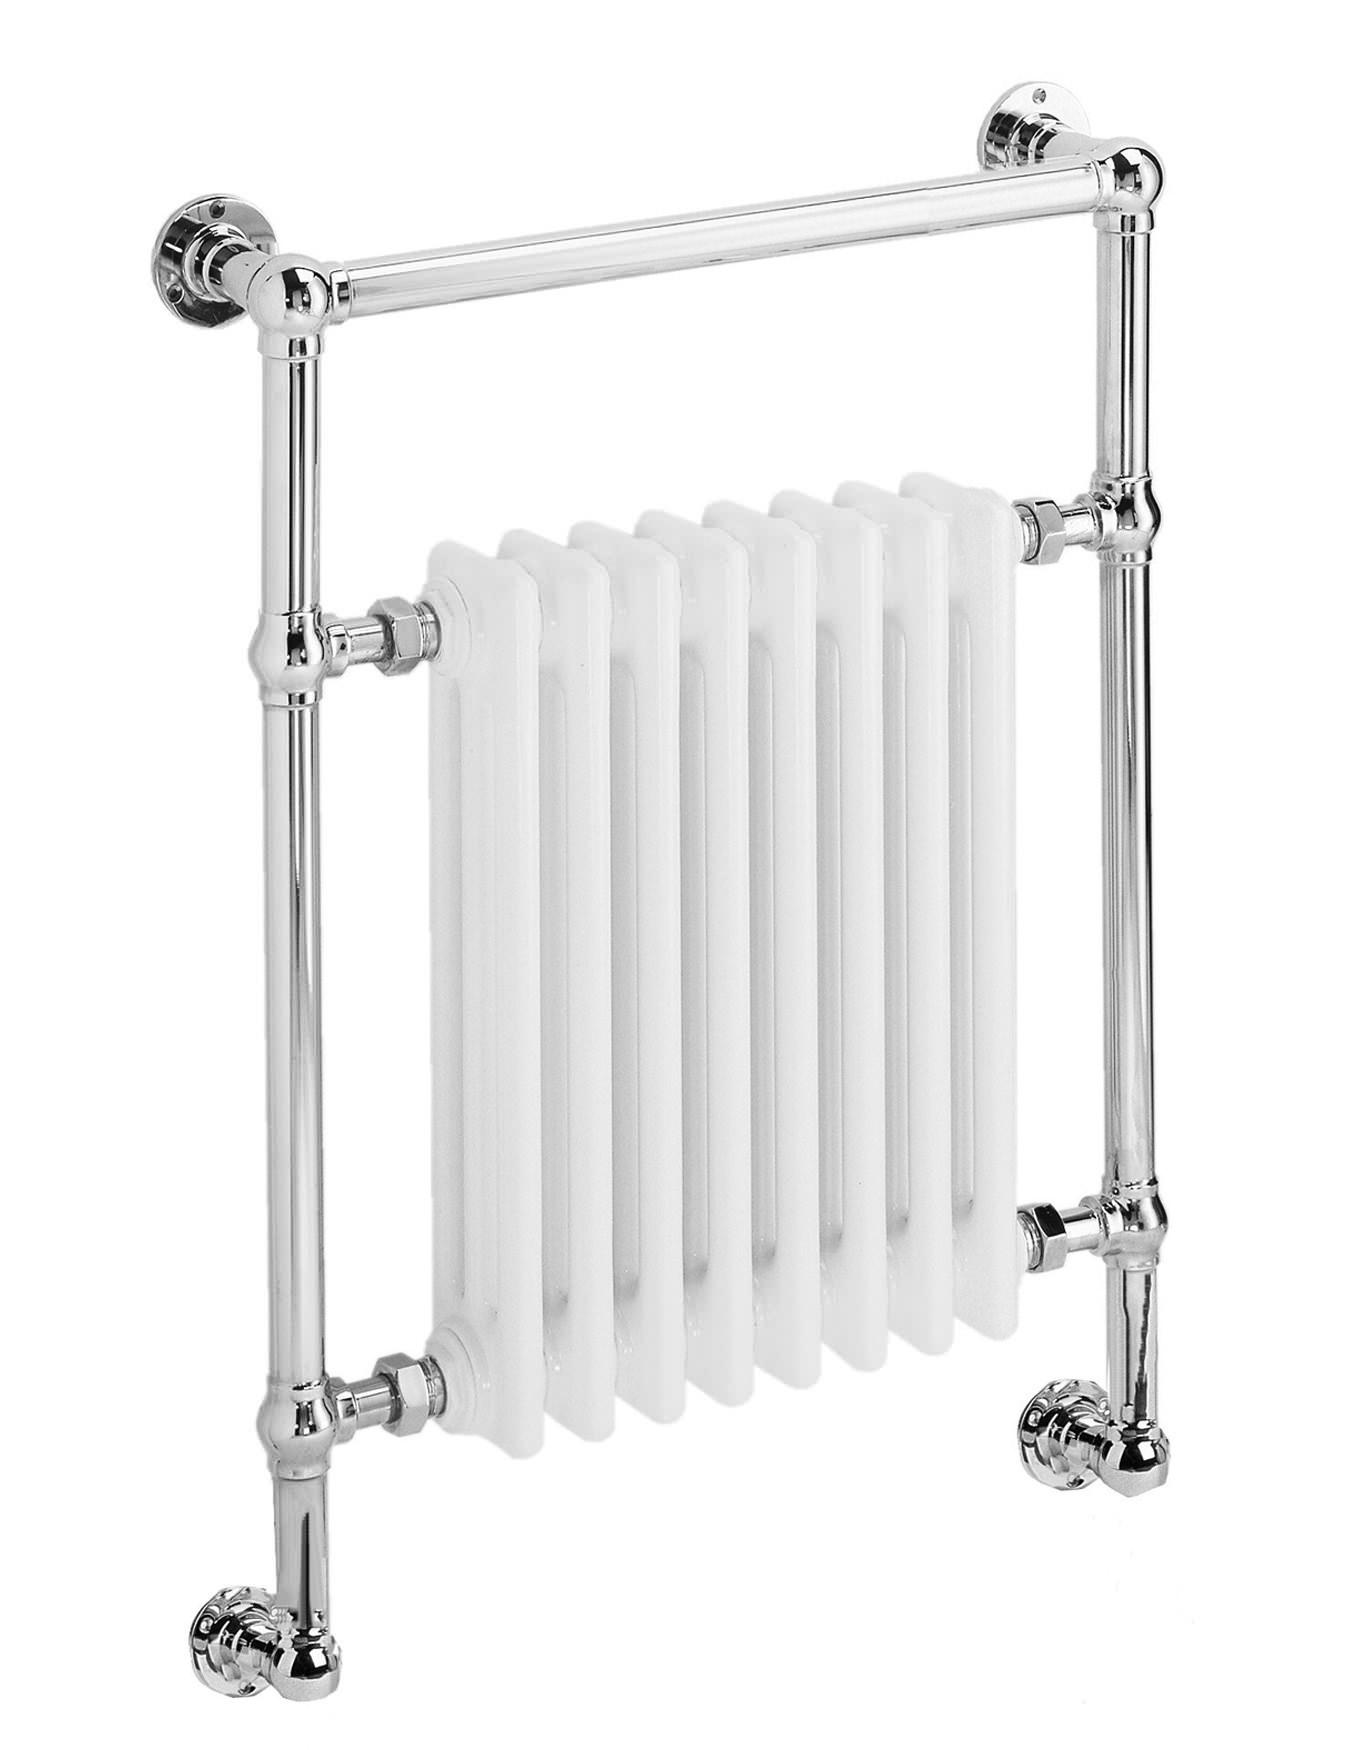 Dq Heating Lynford Wall Mounted Chrome Towel Rail 509 X